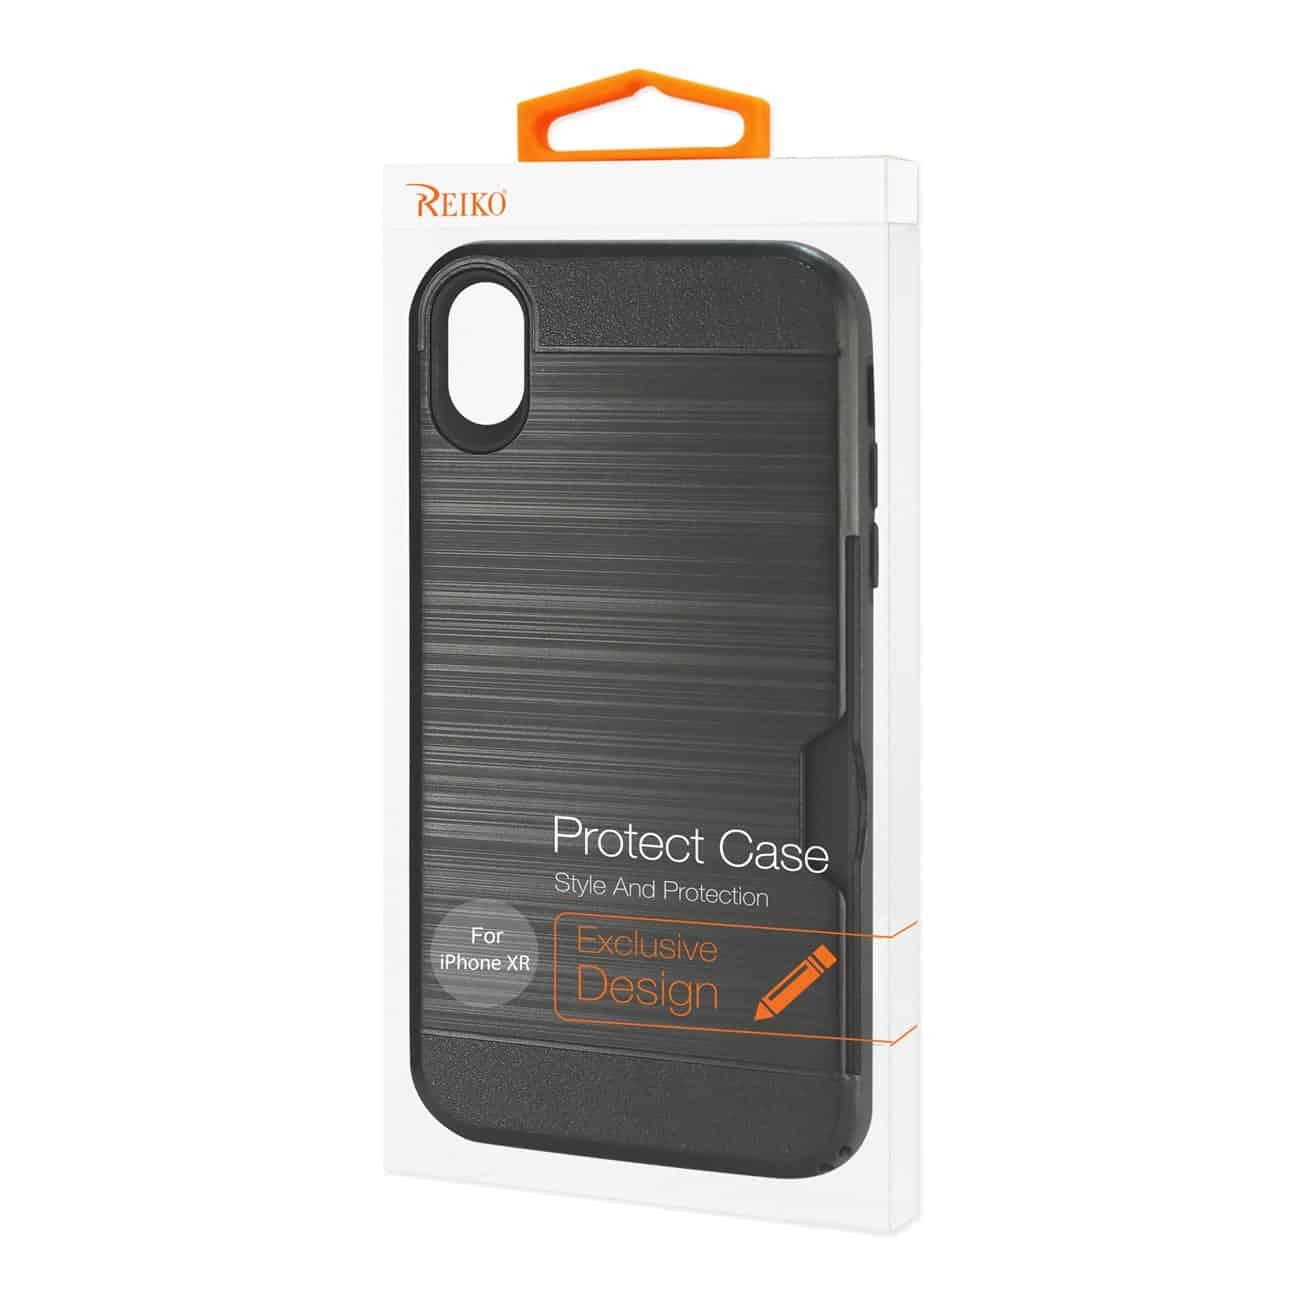 iPhone XR Slim Armor Hybrid Case With Card Holder In Black